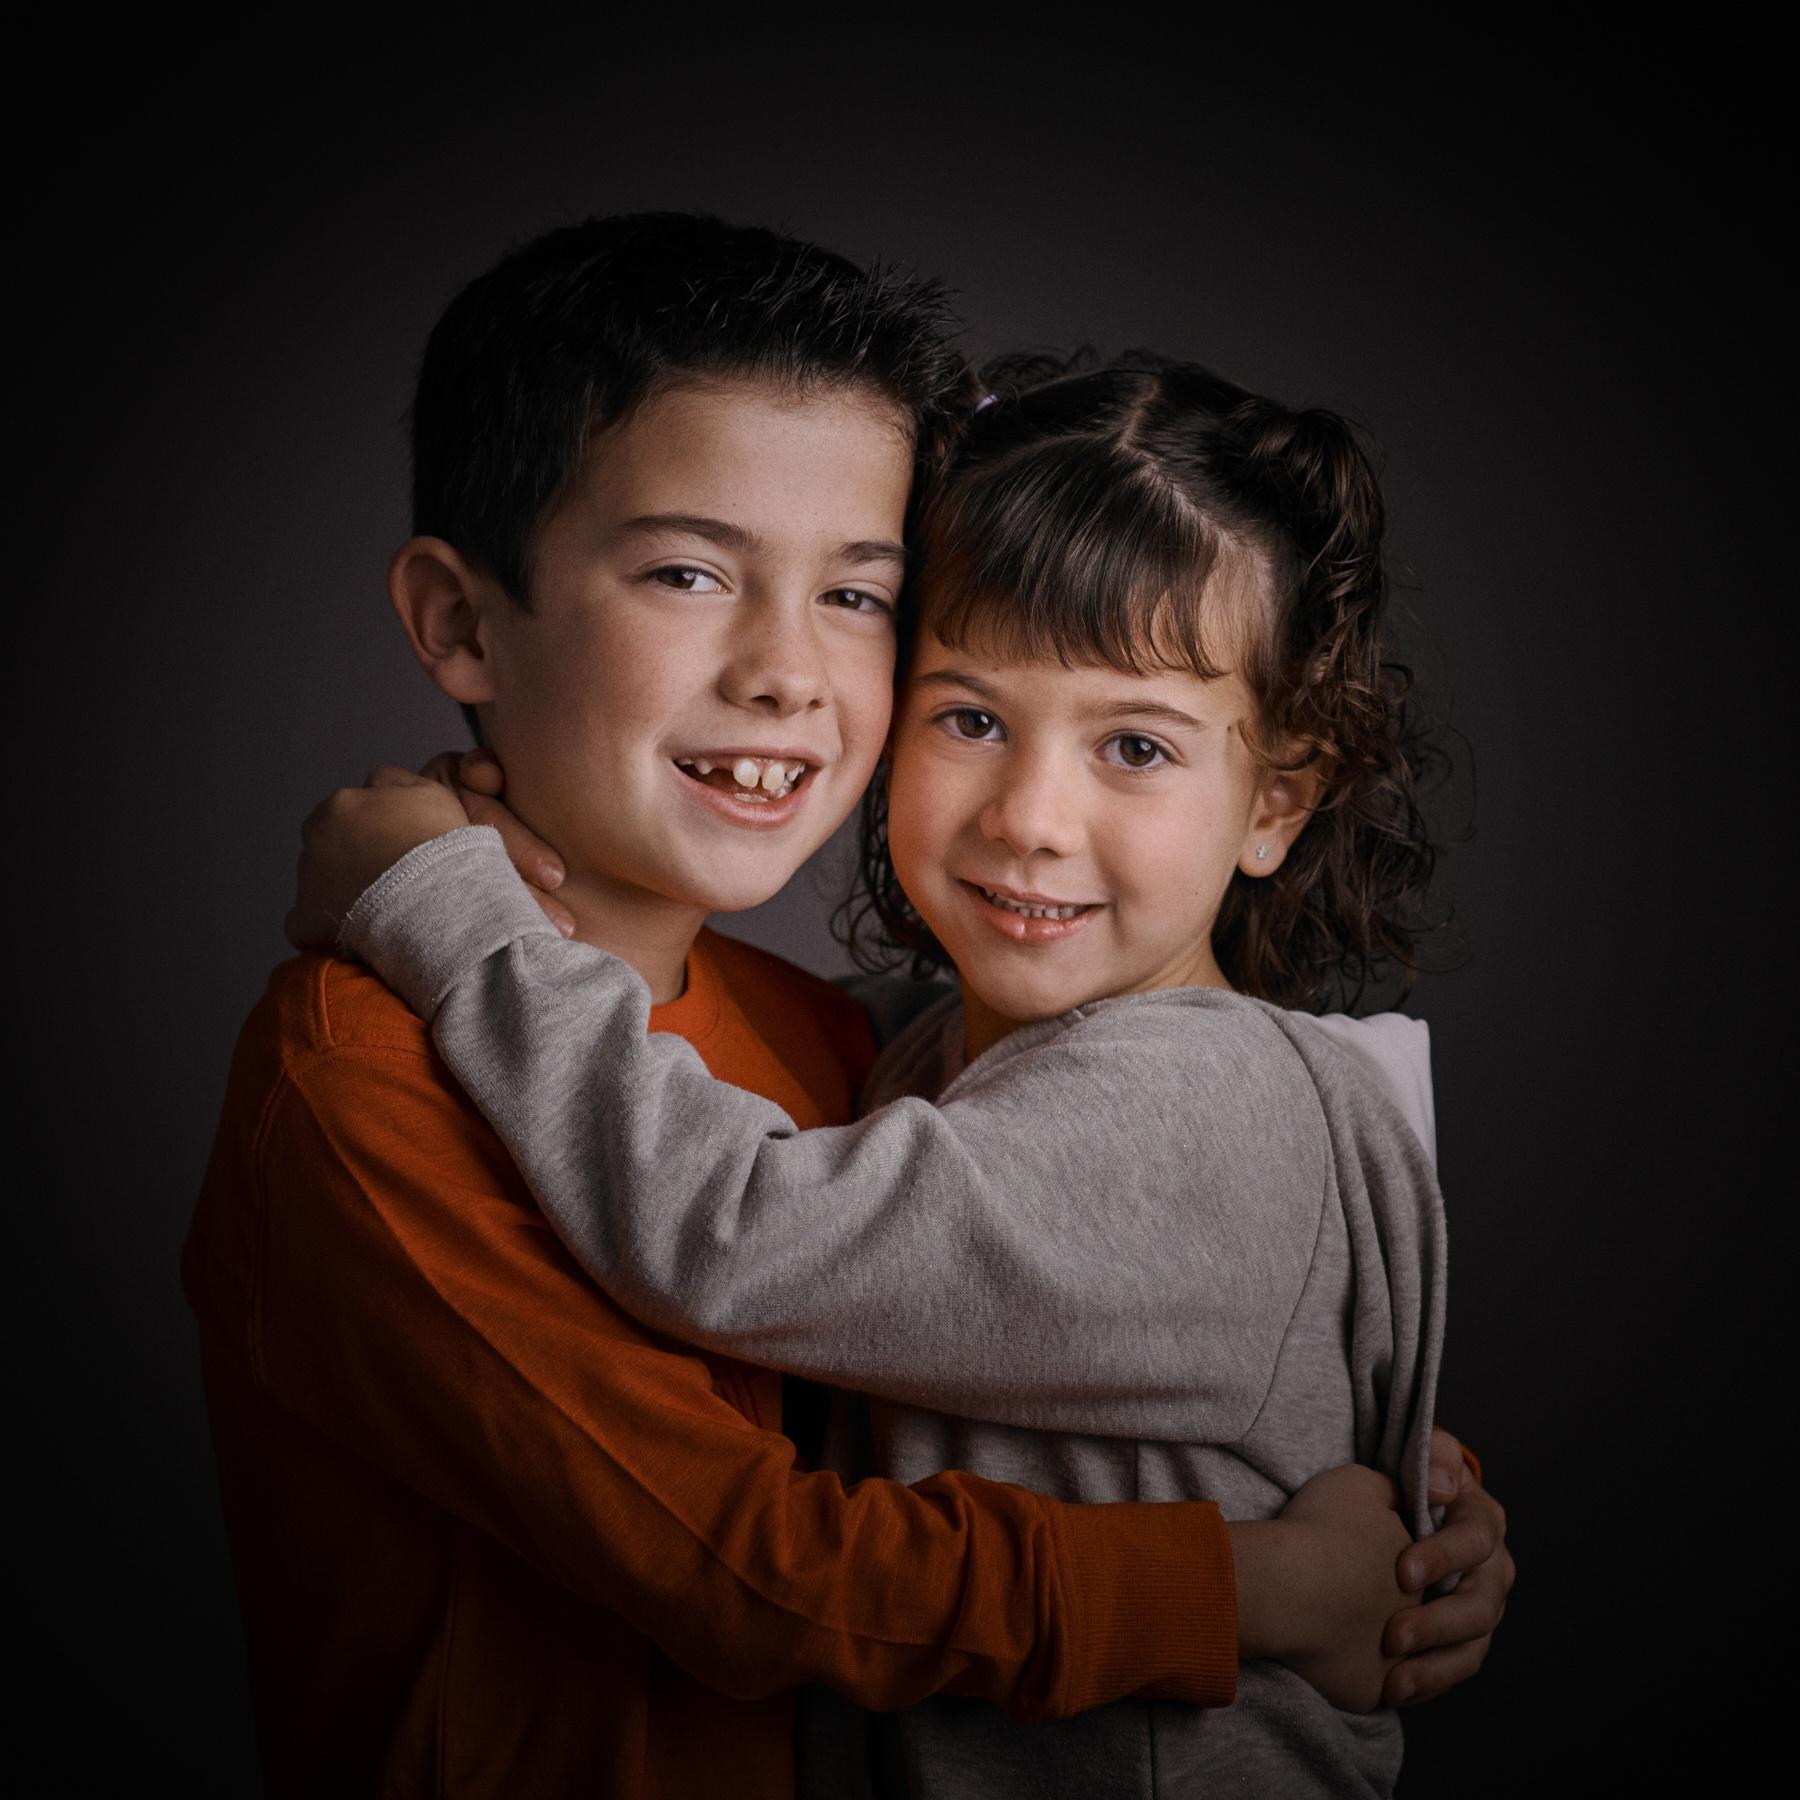 infantil i famílies - Sessió fotogràfica infantil i de família a La Garriga